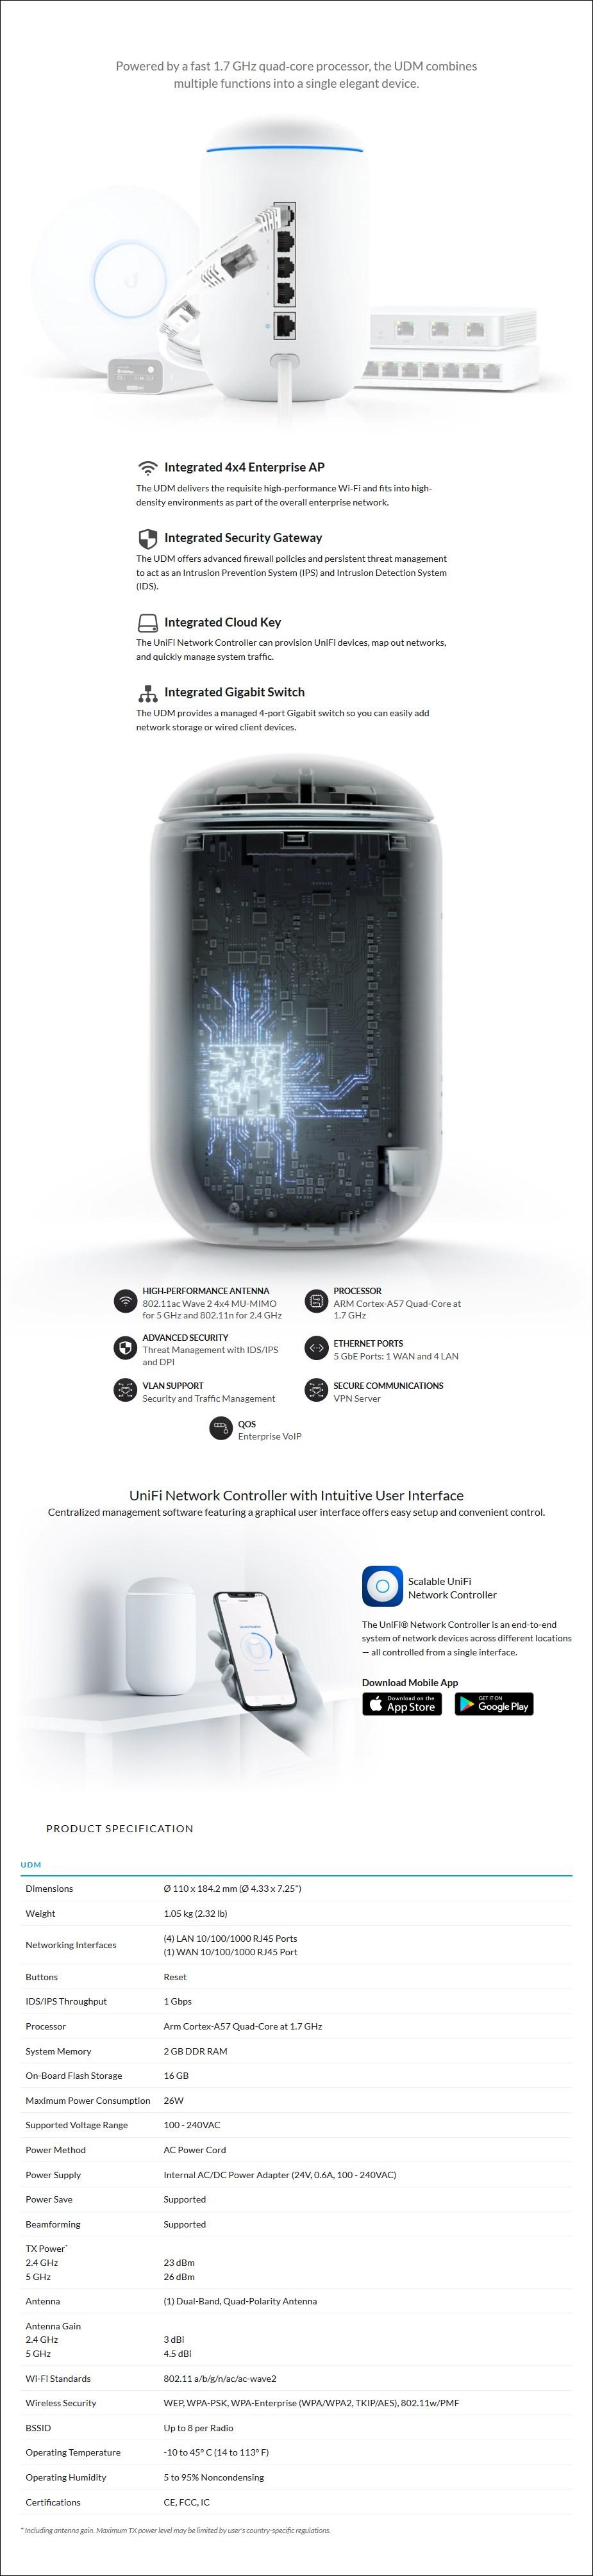 ubiquiti-networks-uniafi-dream-machine-allinone-network-solution-ac29287-9.jpg